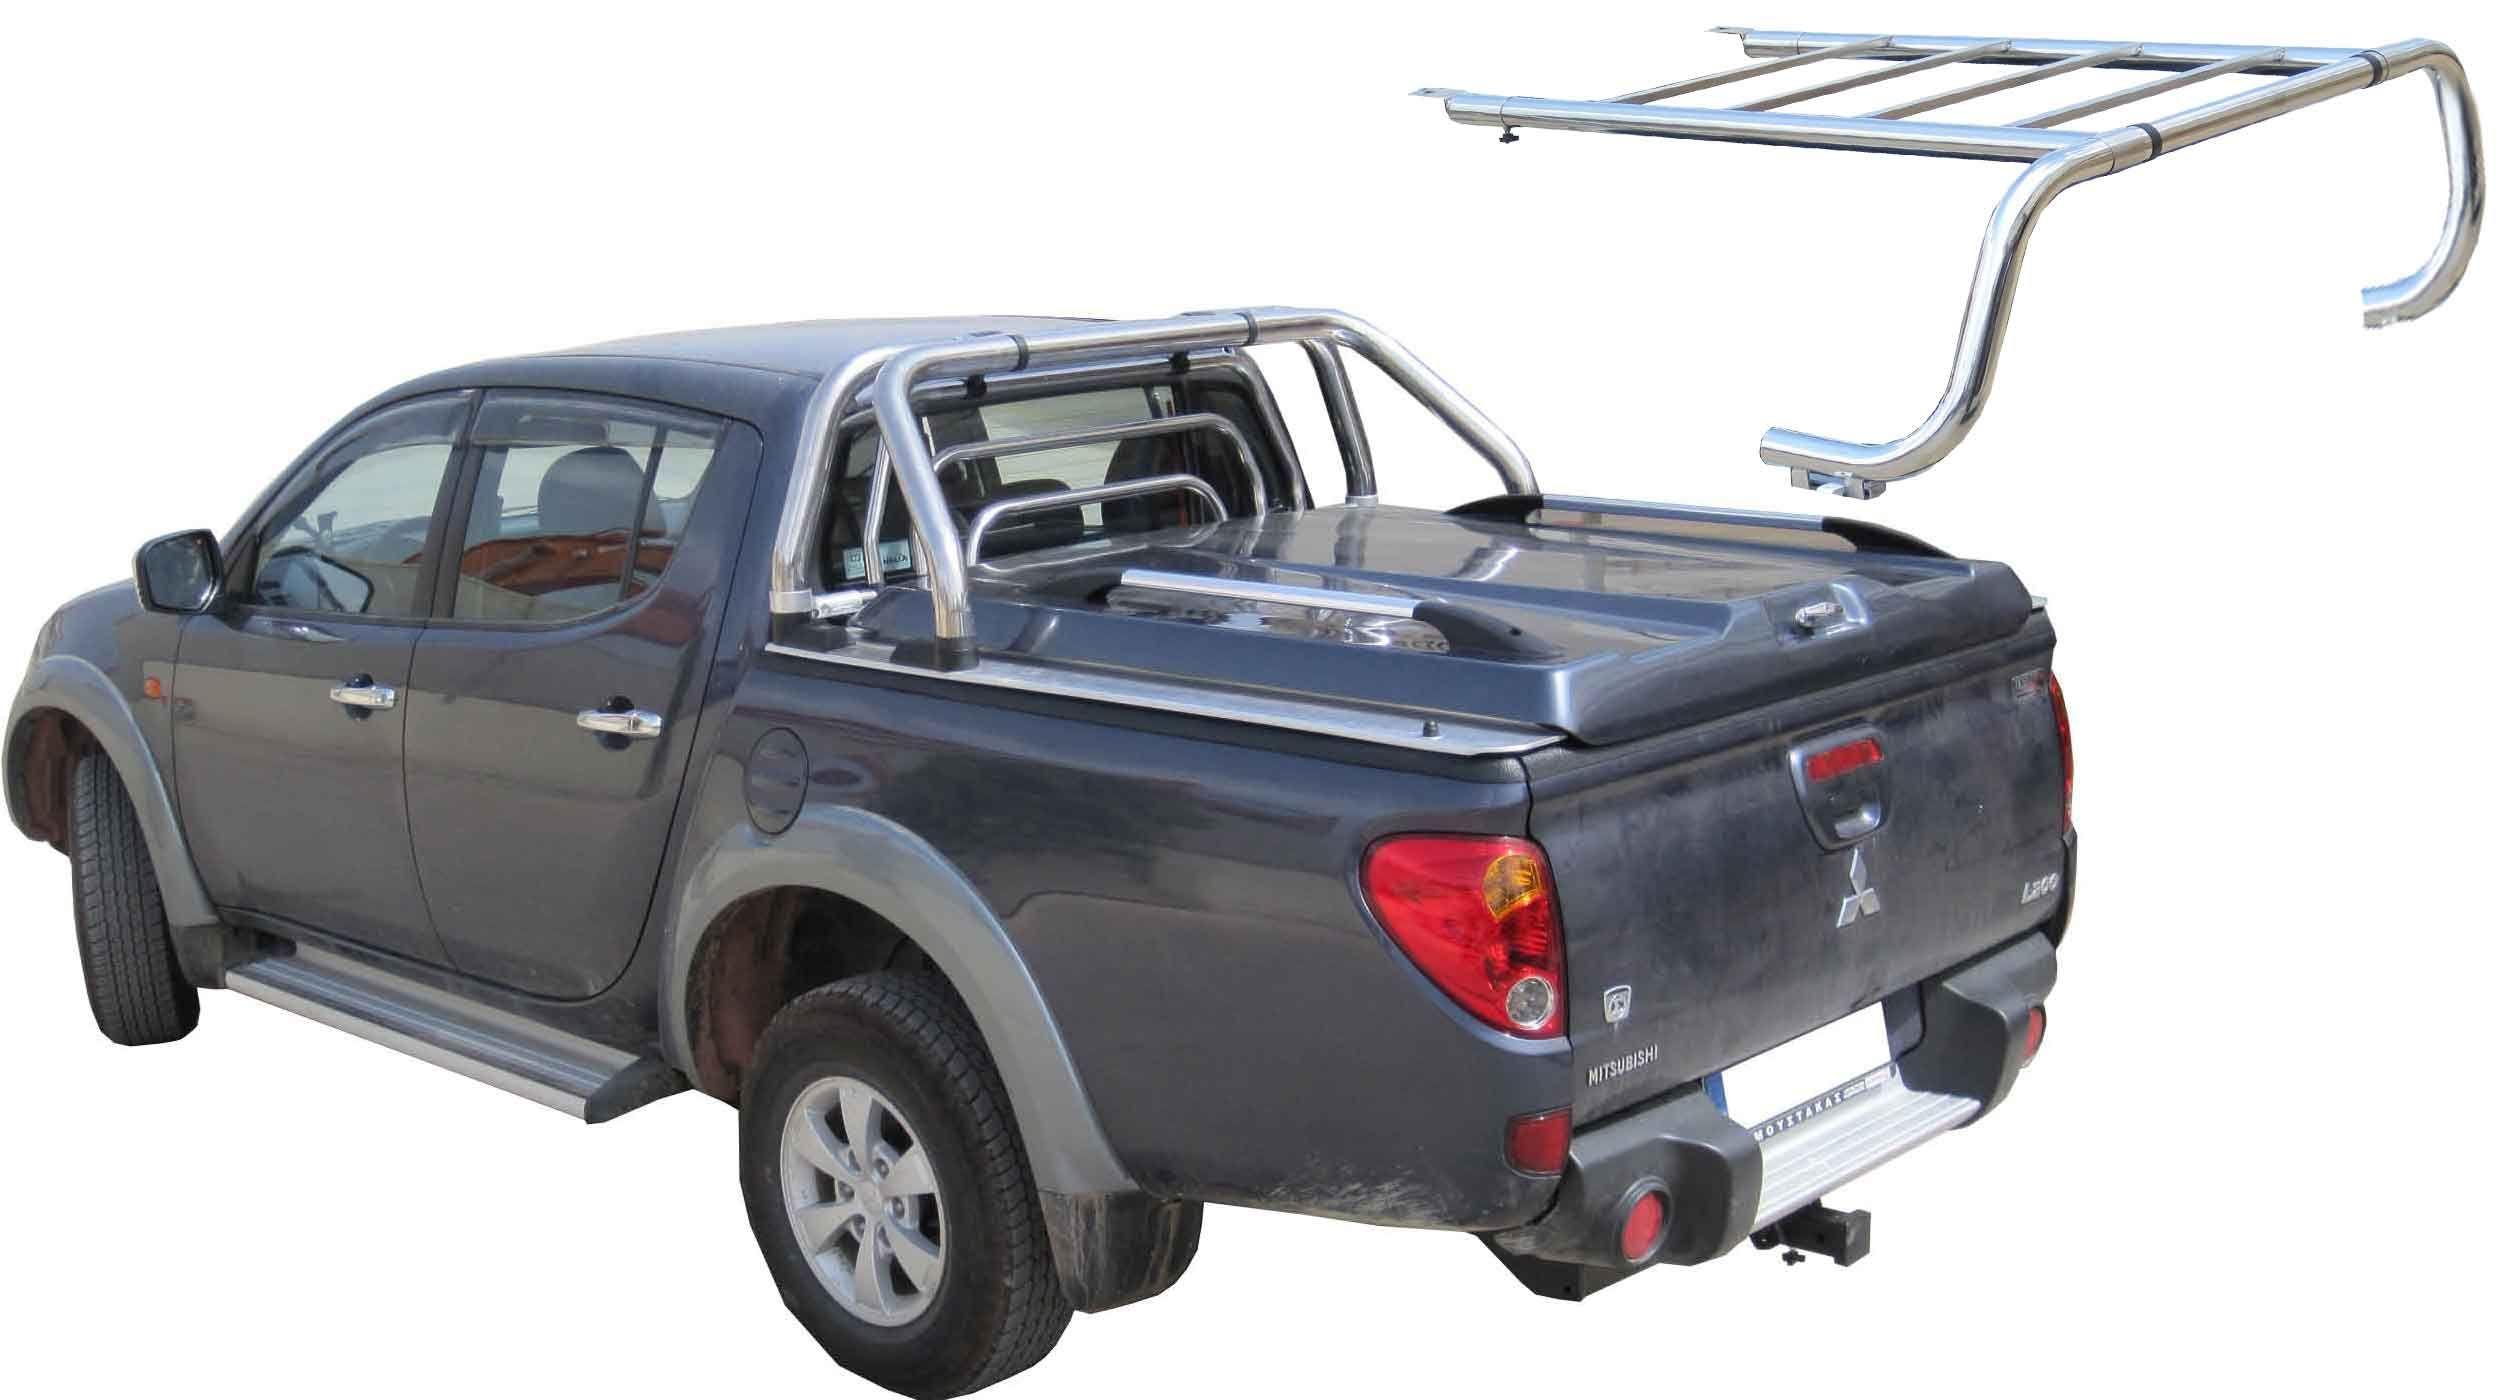 Roof racks & Roof rails Mitsubishi L200 (Triton) 2006